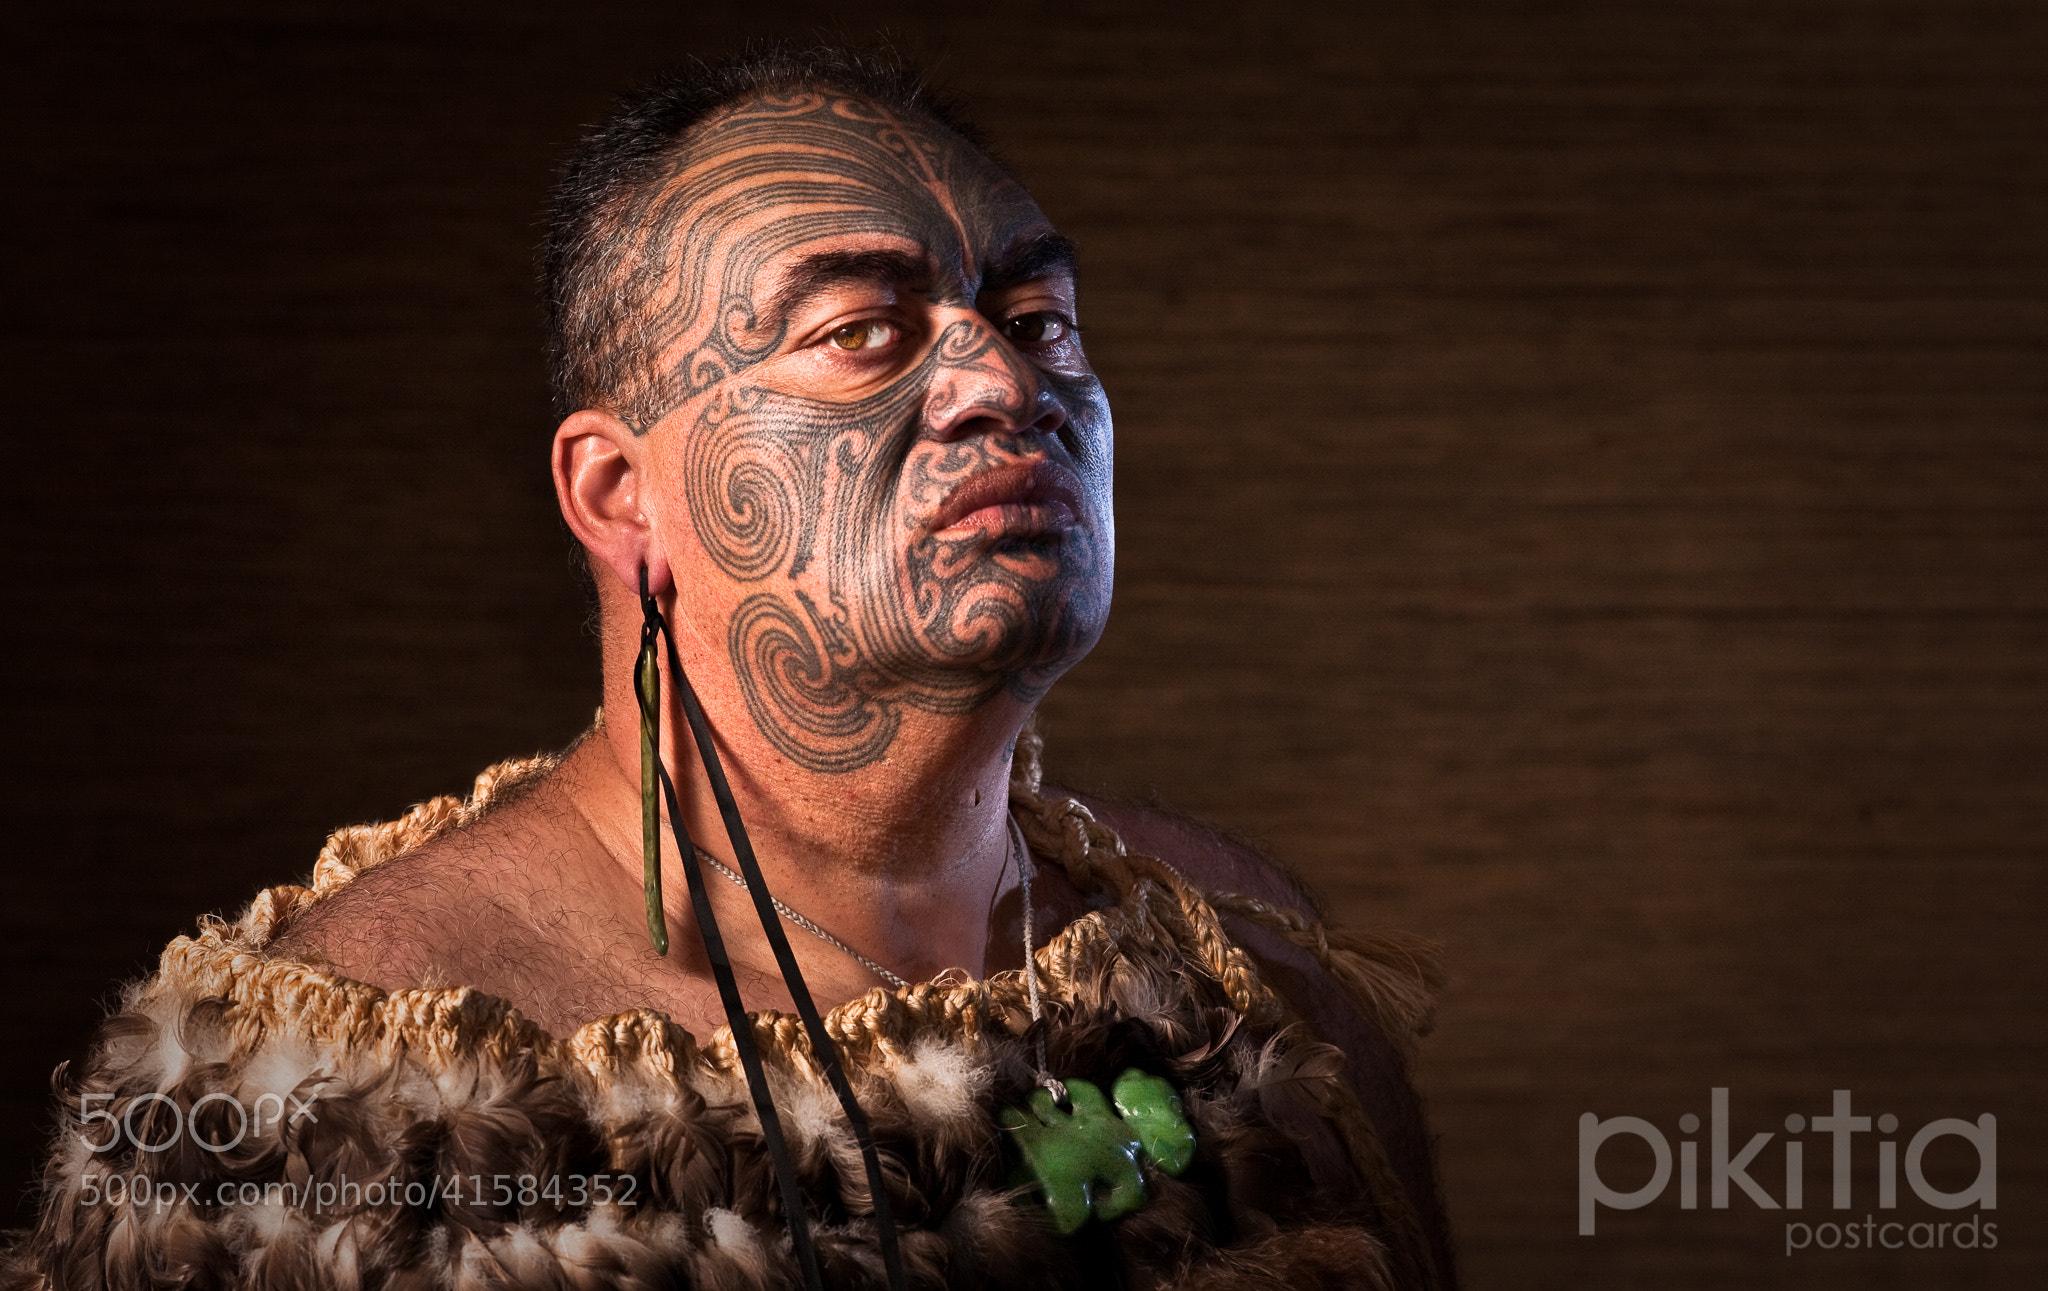 Photograph Tā Moko by Pikitia Postcards  on 500px